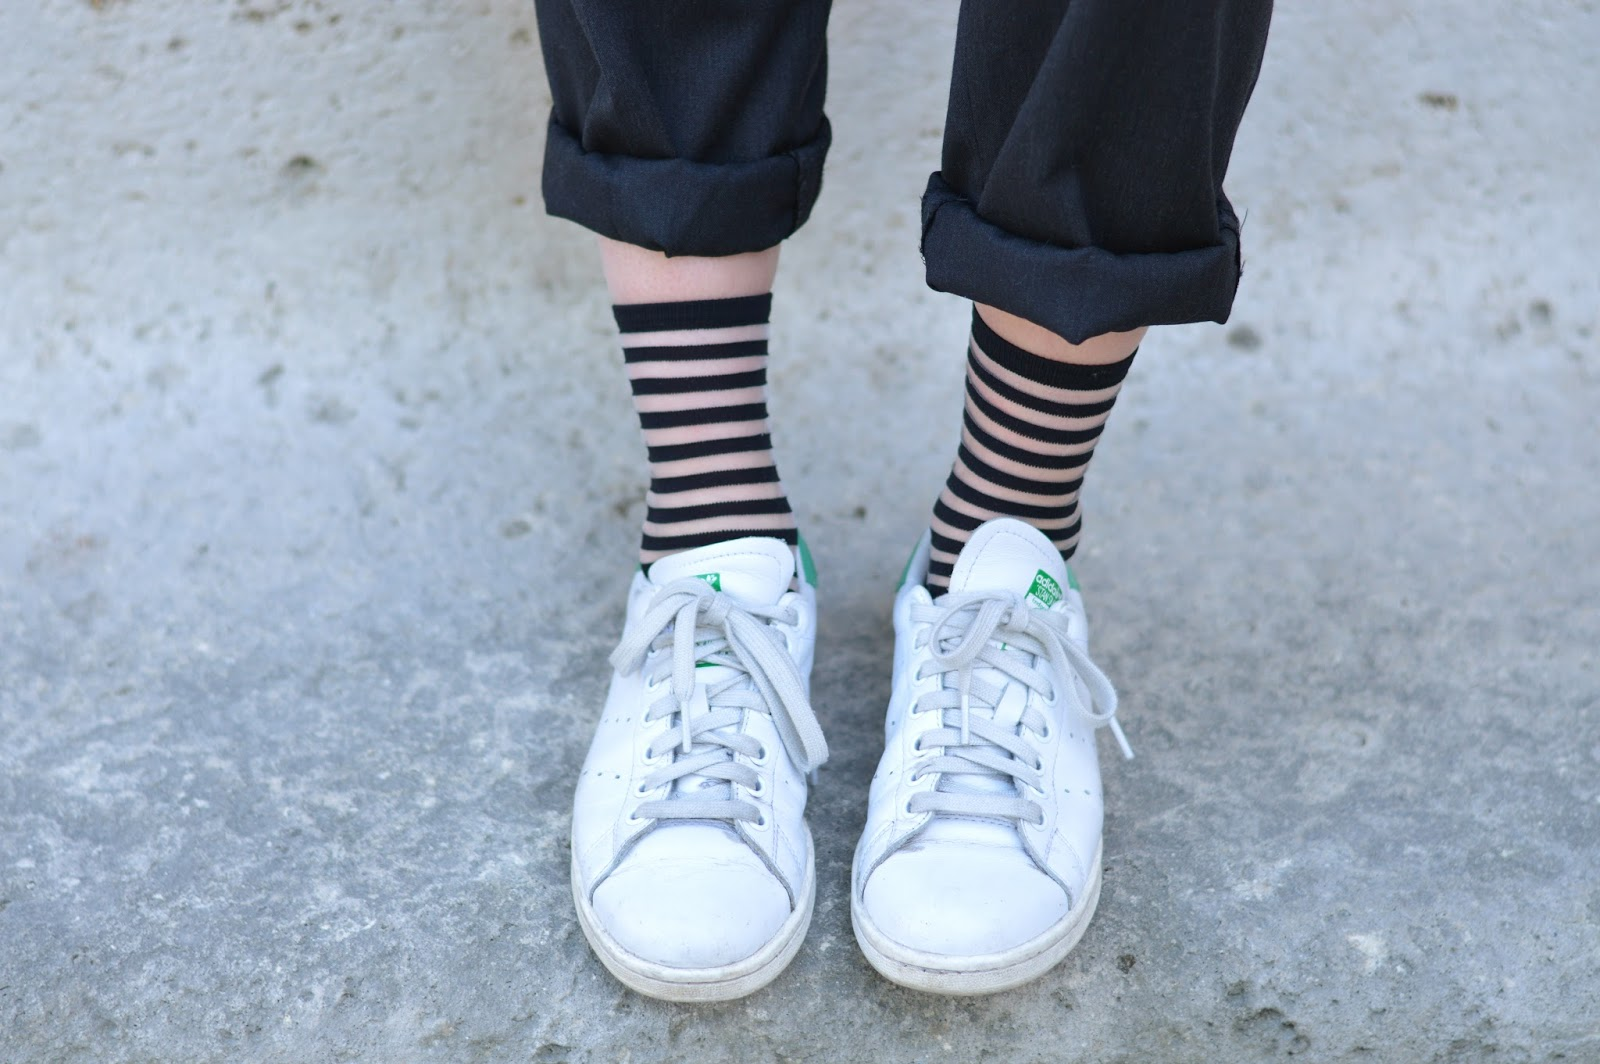 Adidas Stan Smiths and Cos stripy socks